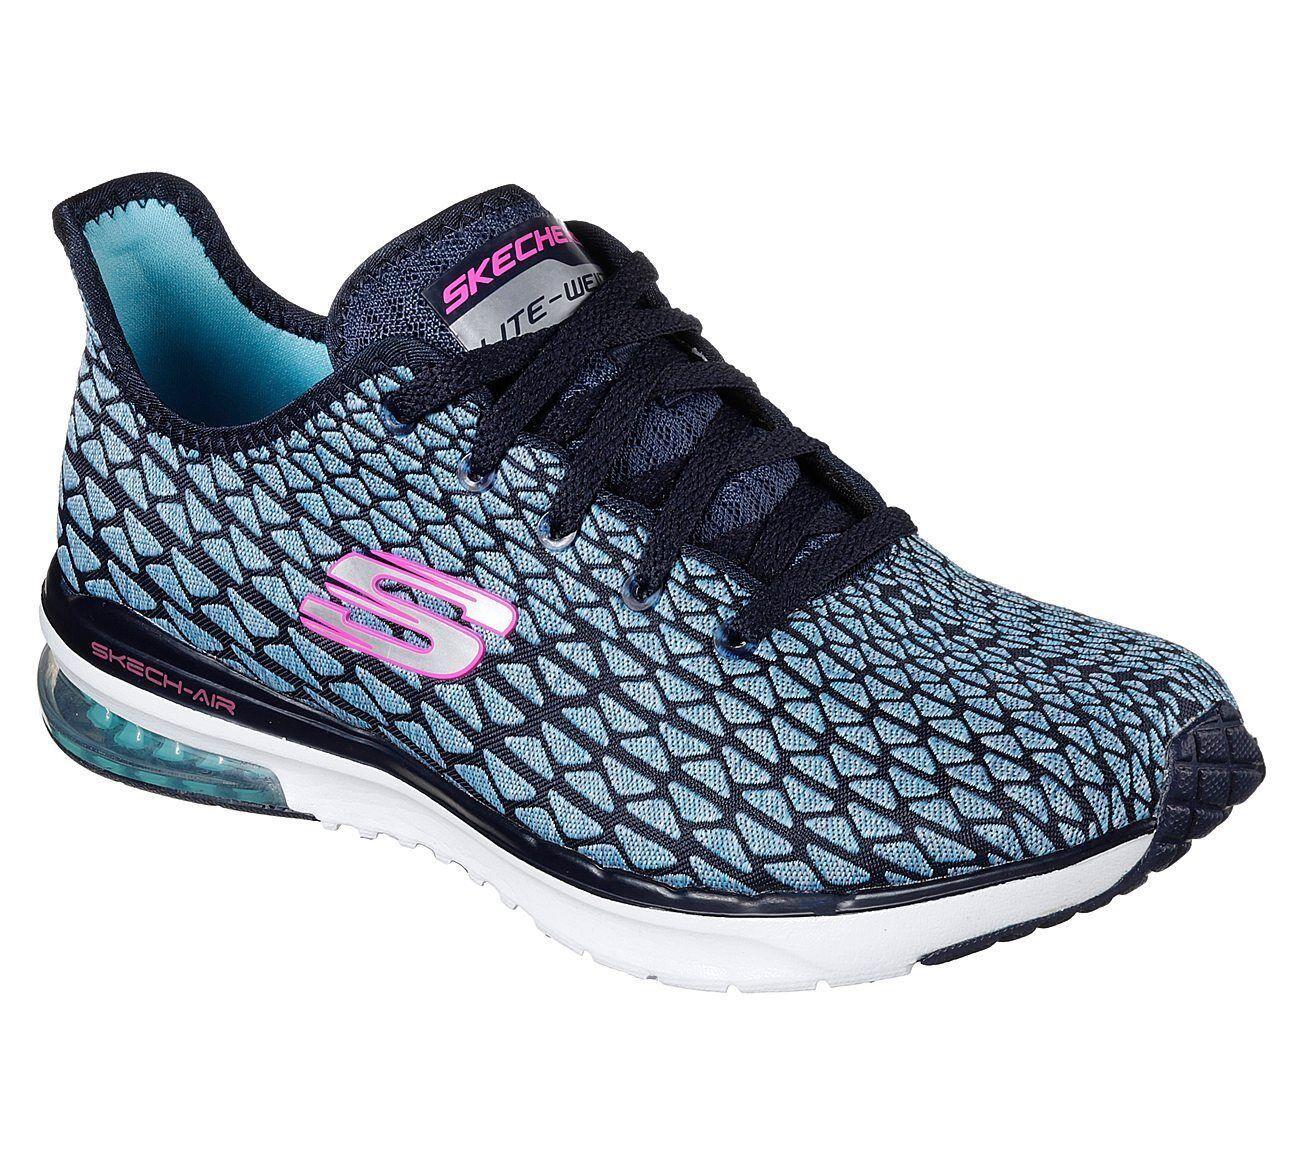 Skechers Skech-Air Infinity Free Fallin Foam Trainers Memory Foam Fallin Sports Schuhes Damenschuhe 42f155